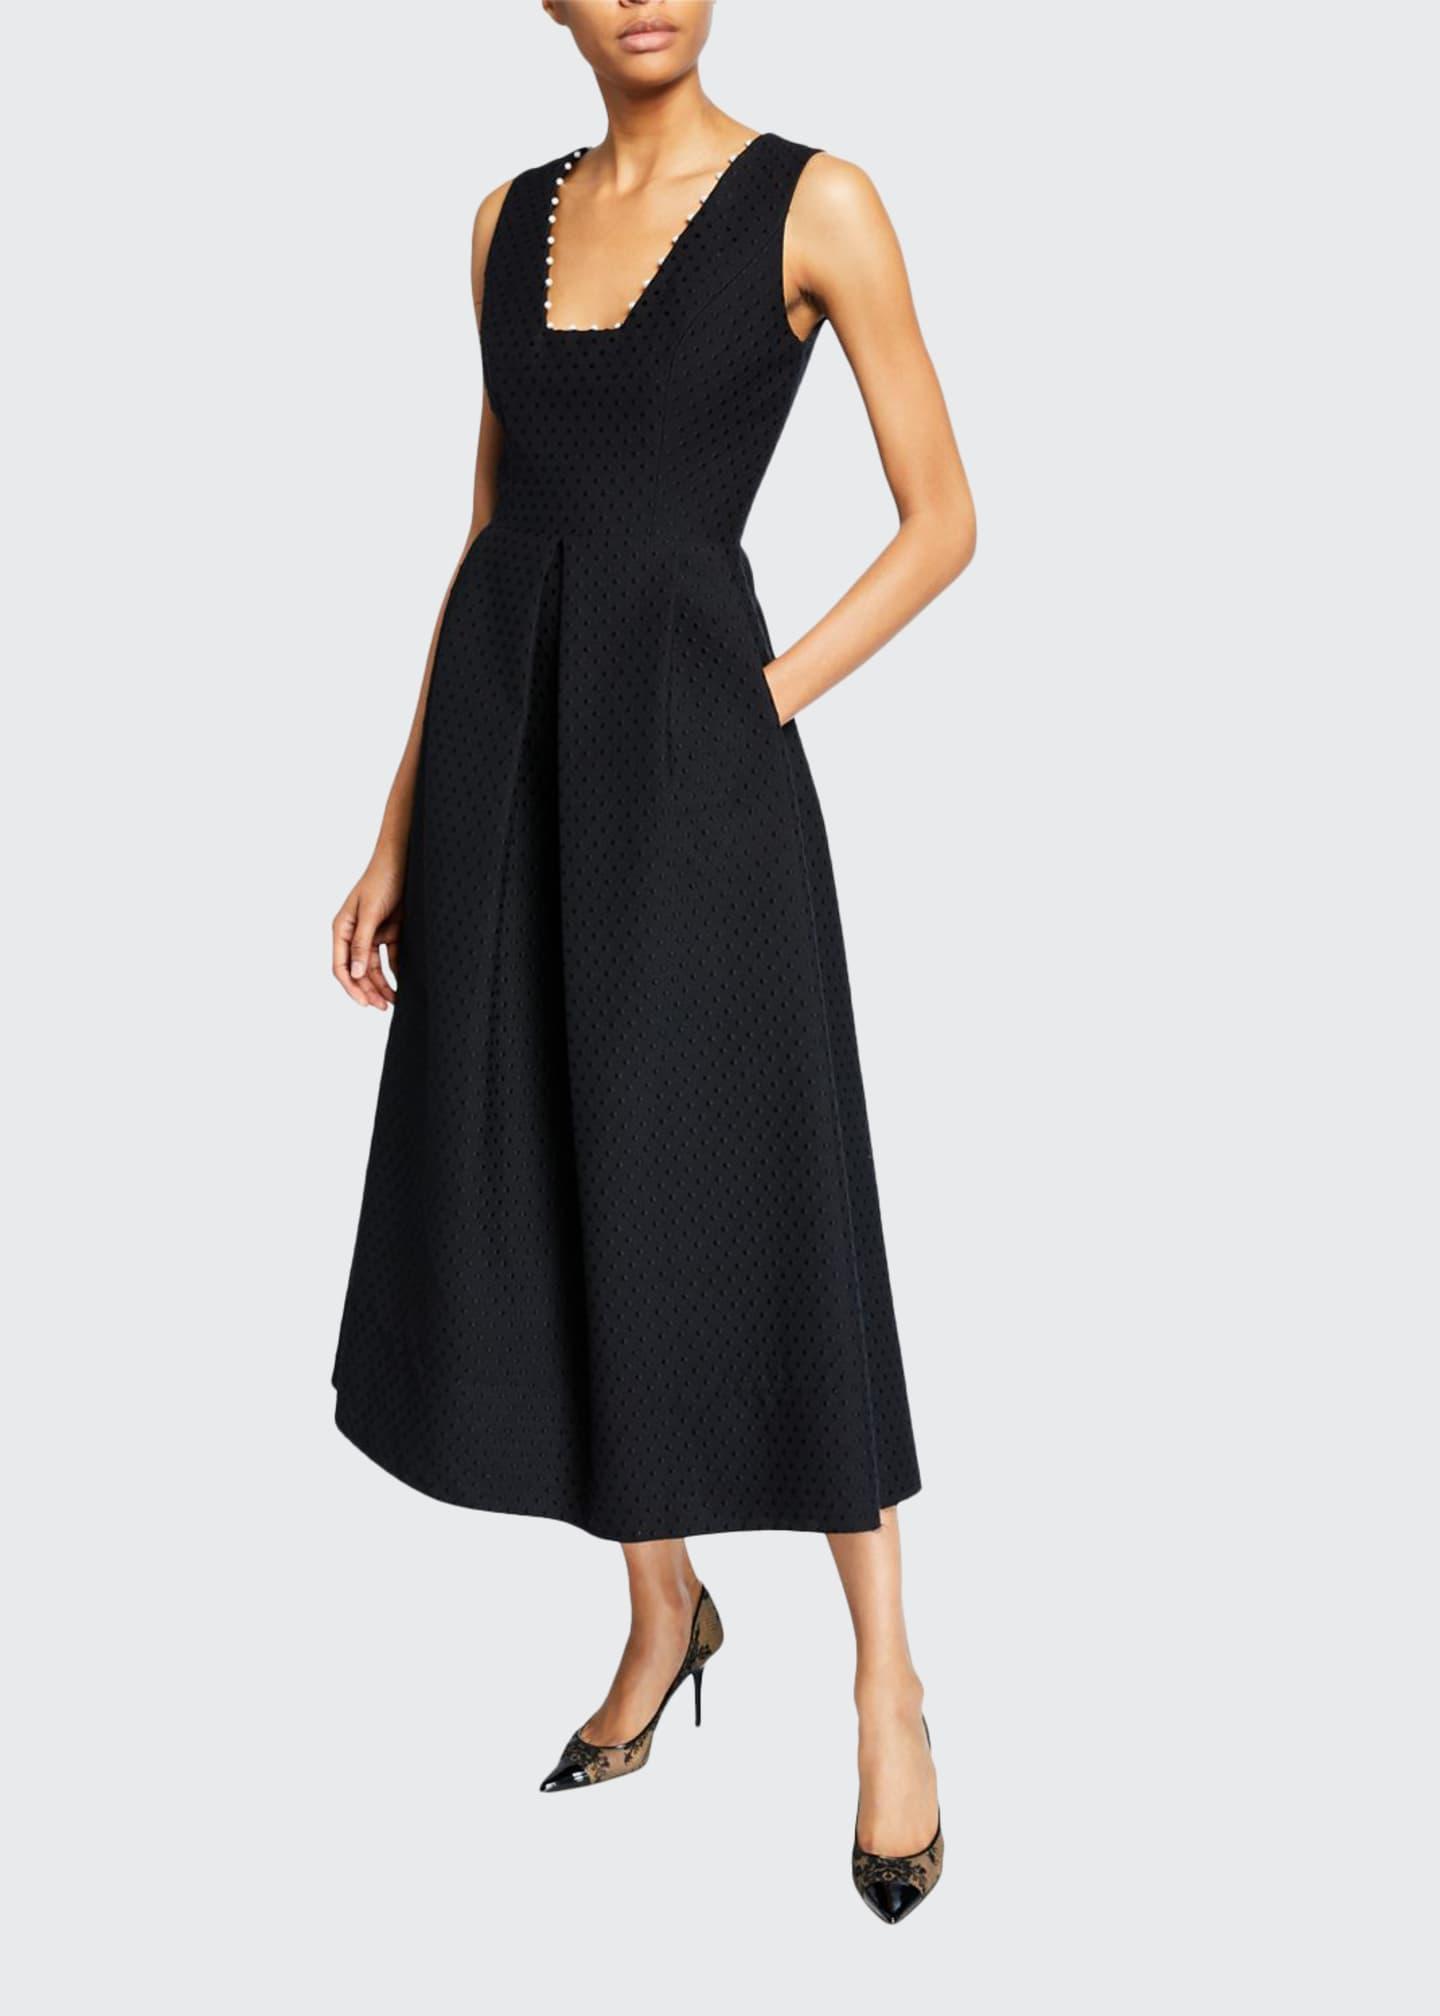 Lela Rose Raised Dot Jacquard Pearly-Detail Dress